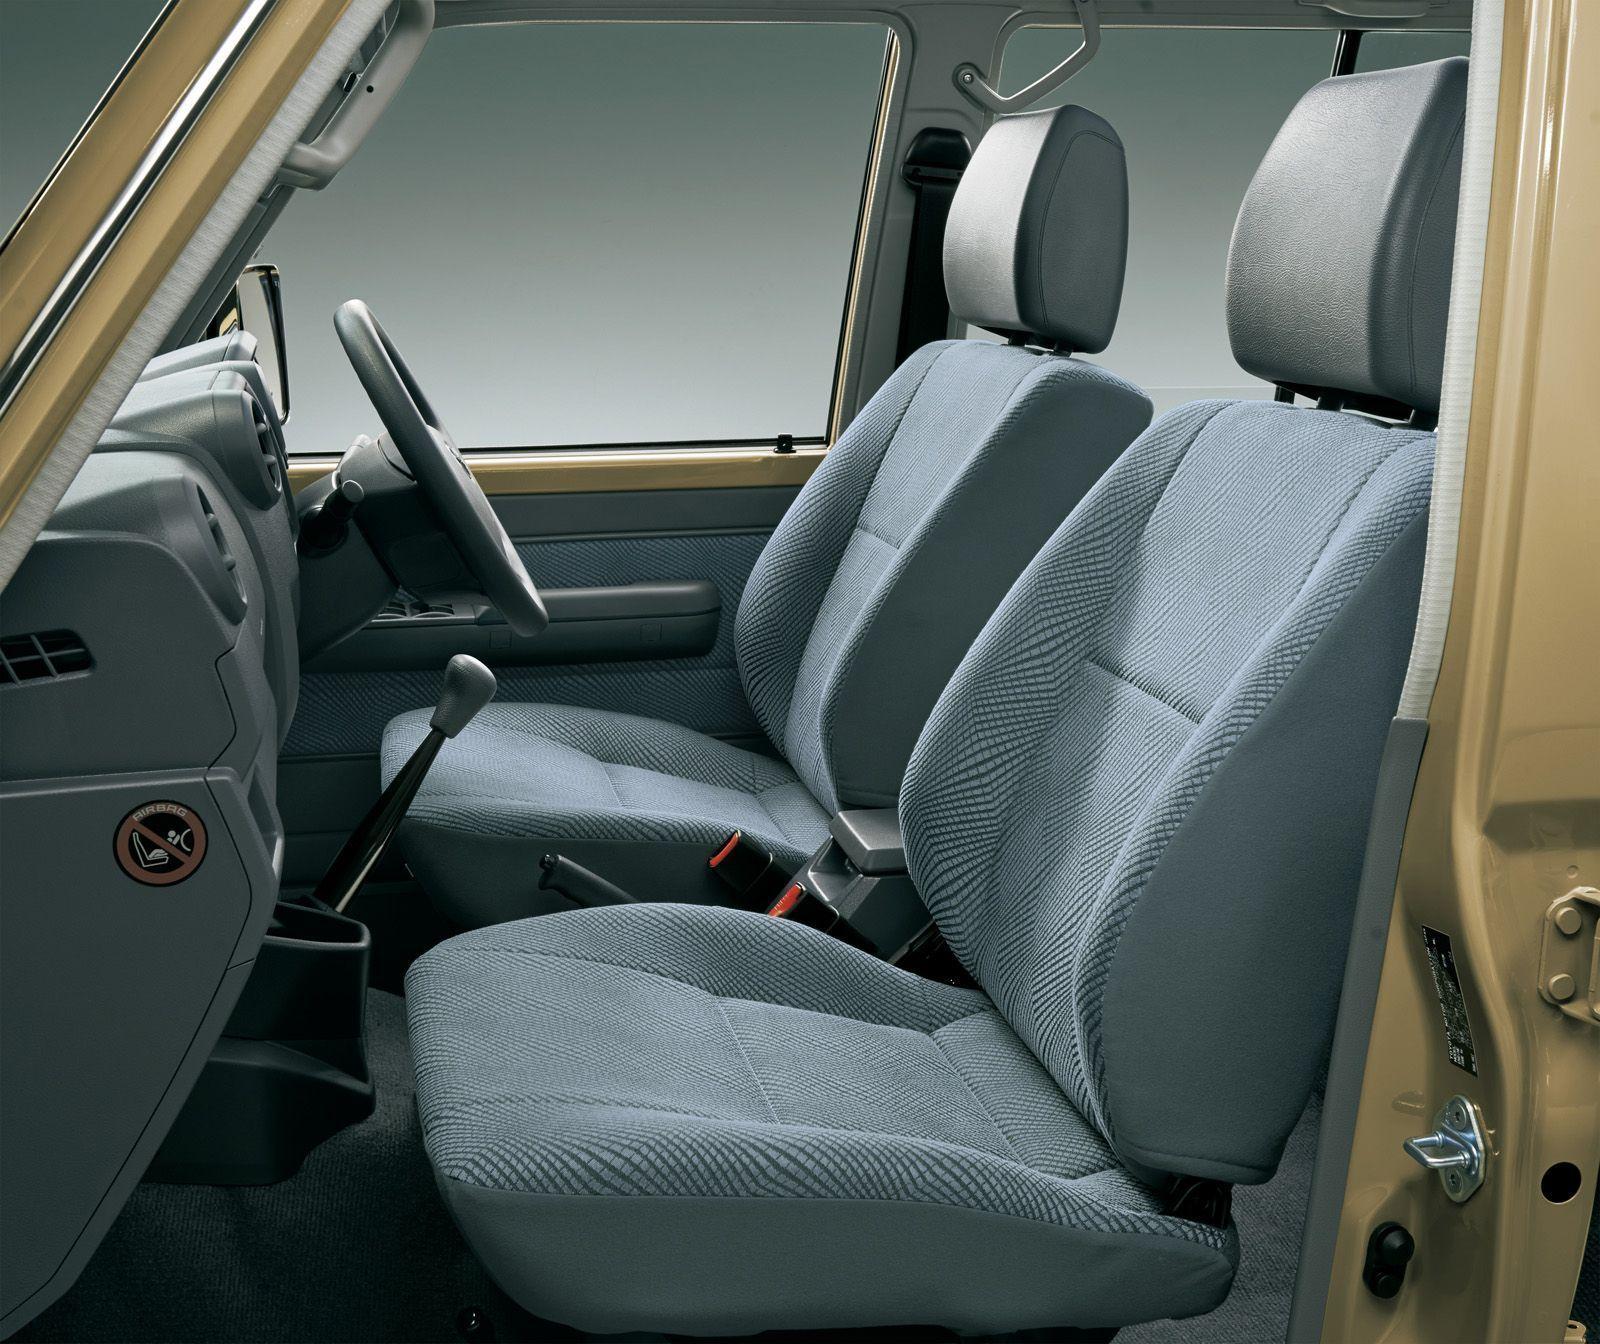 Toyota-Land-Cruiser-70-Series-14